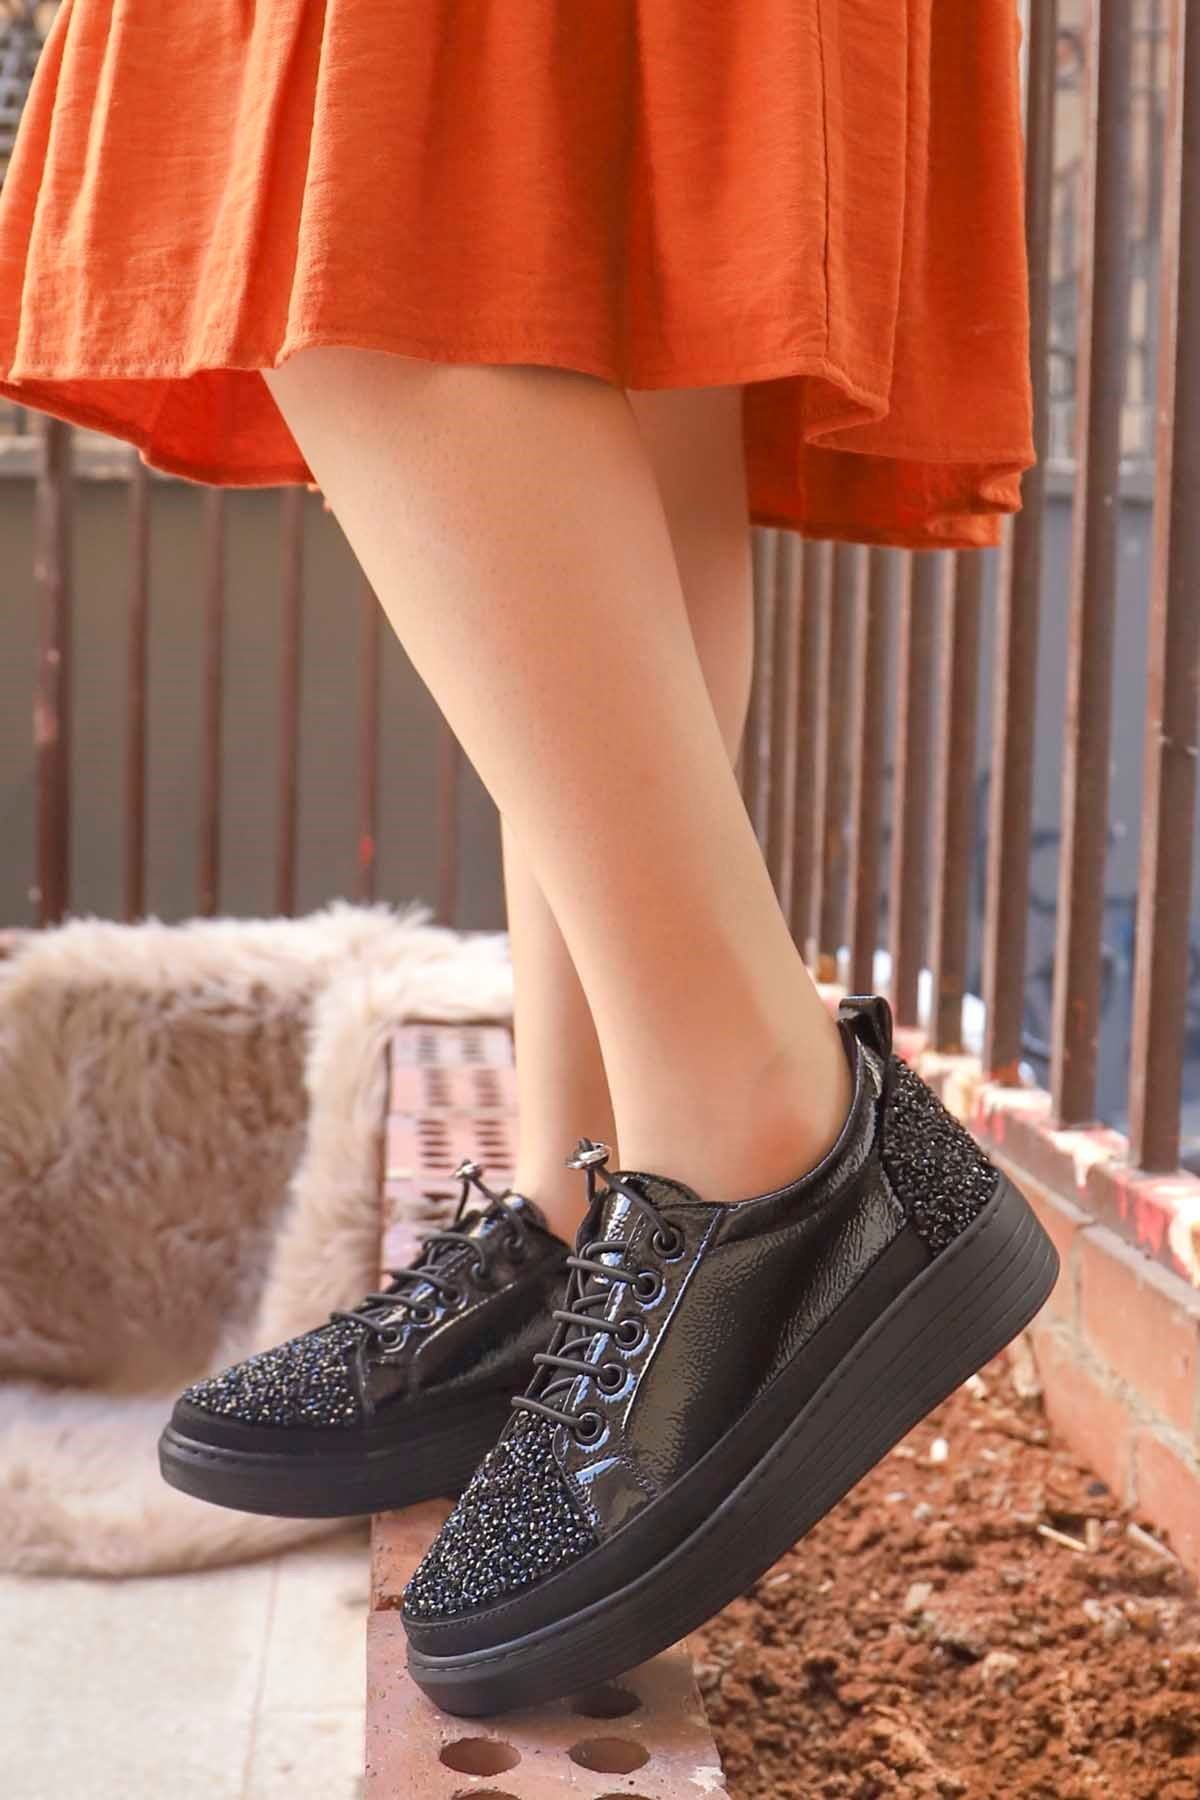 mami-077 Taş Detay Spor Ayakkabı Siyah Rugan